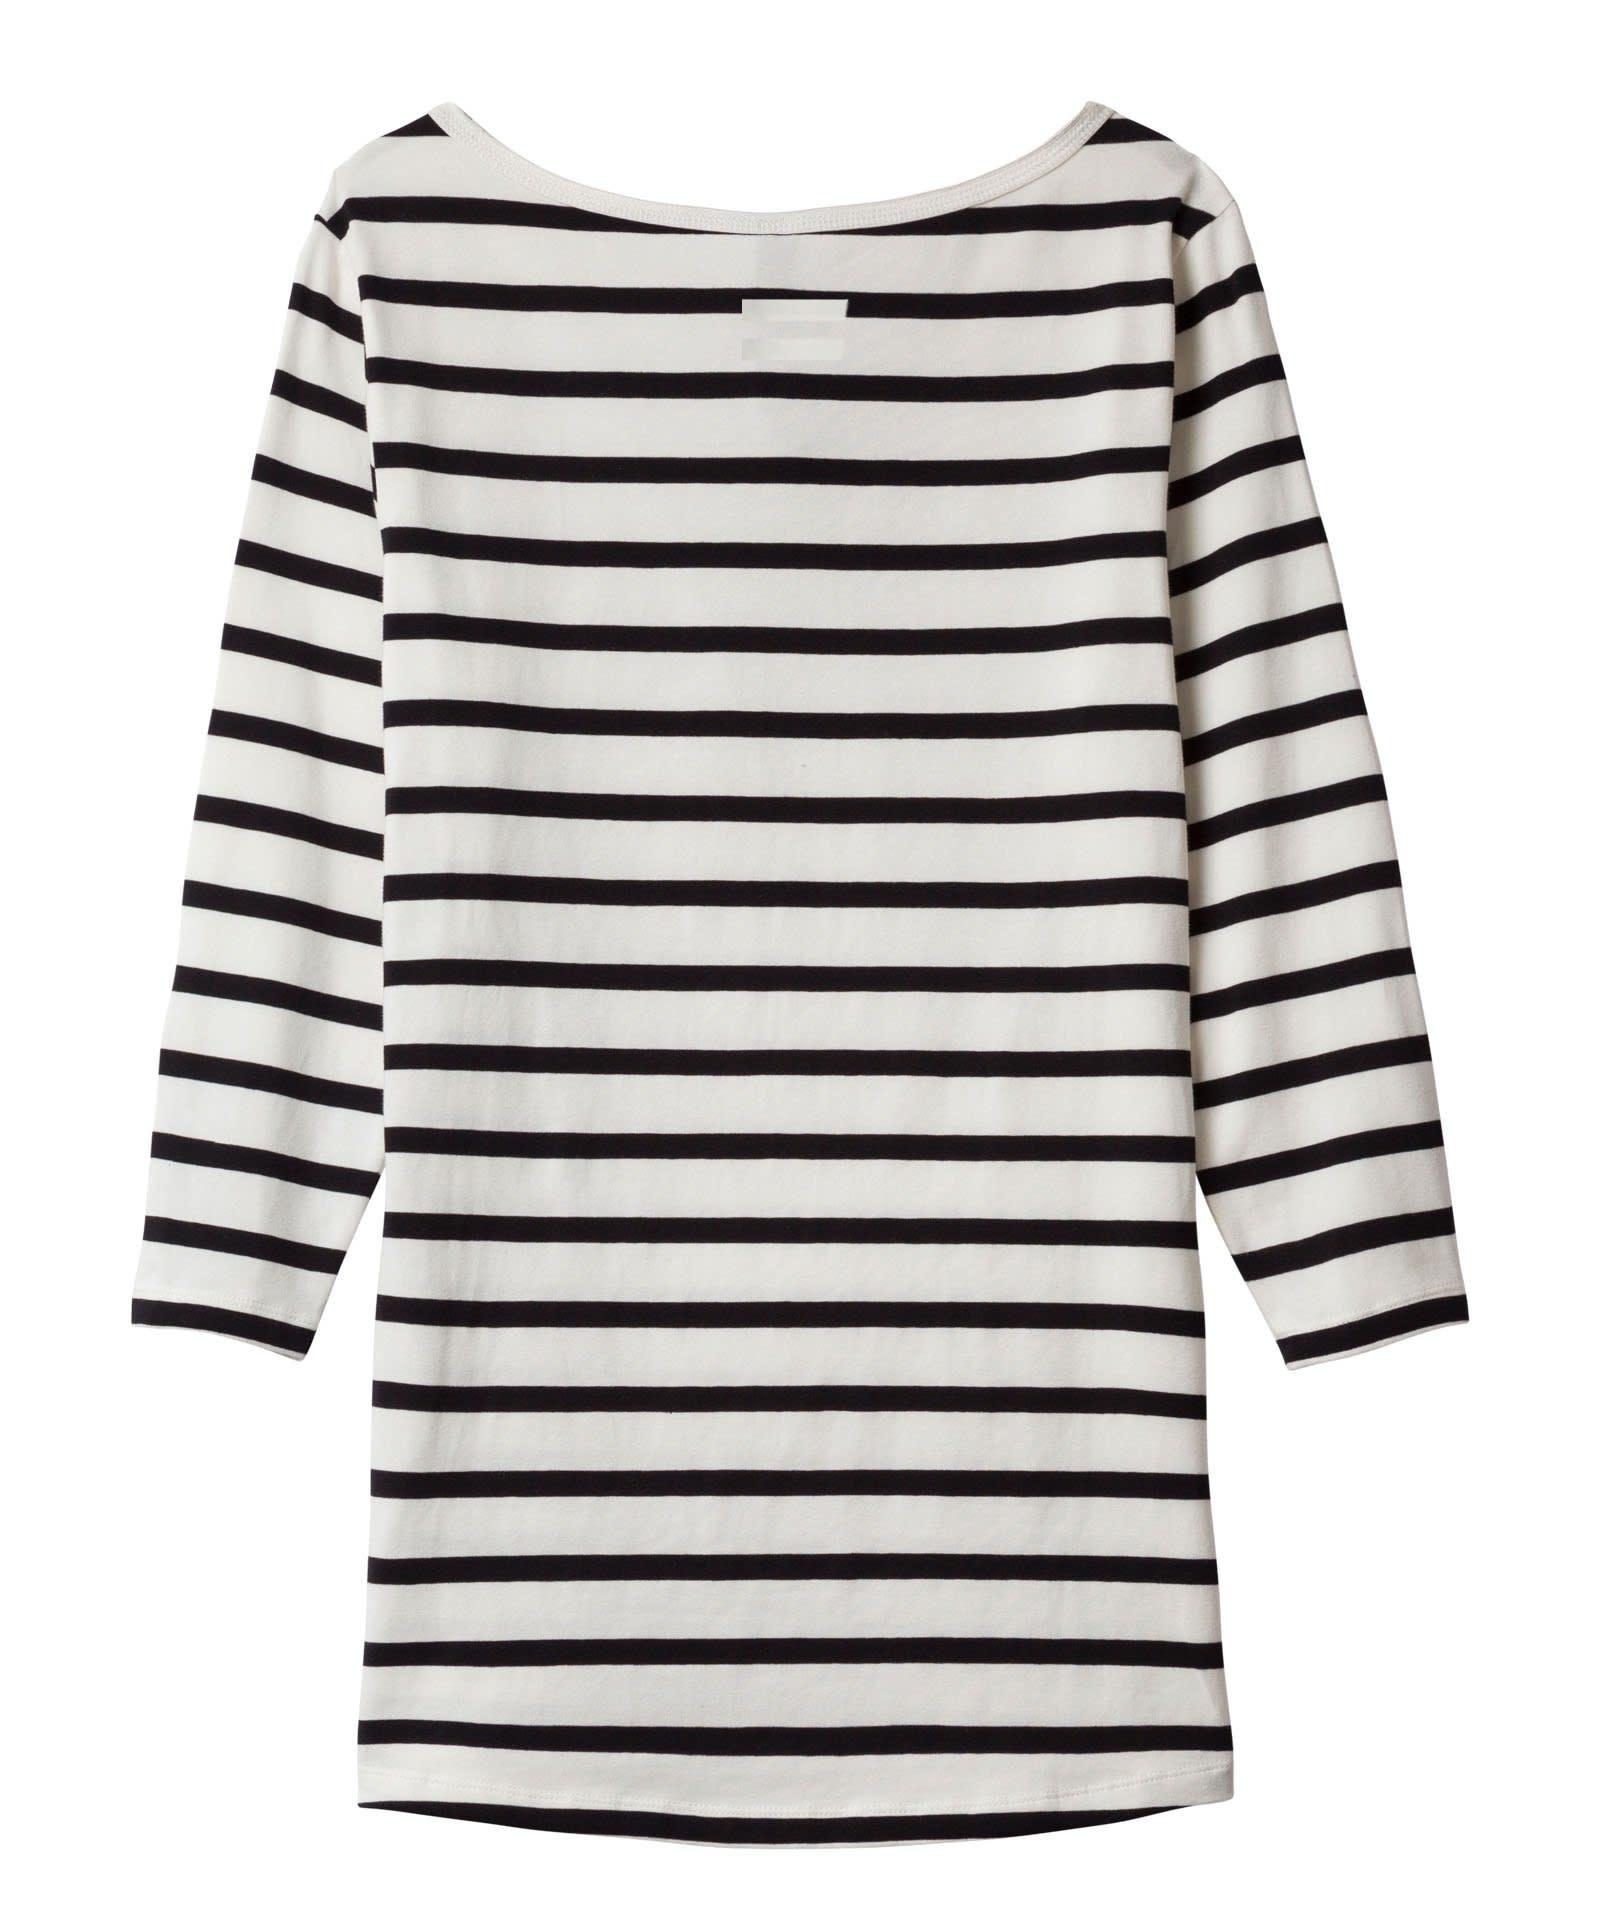 Shirt slim fit boat neck tee-2